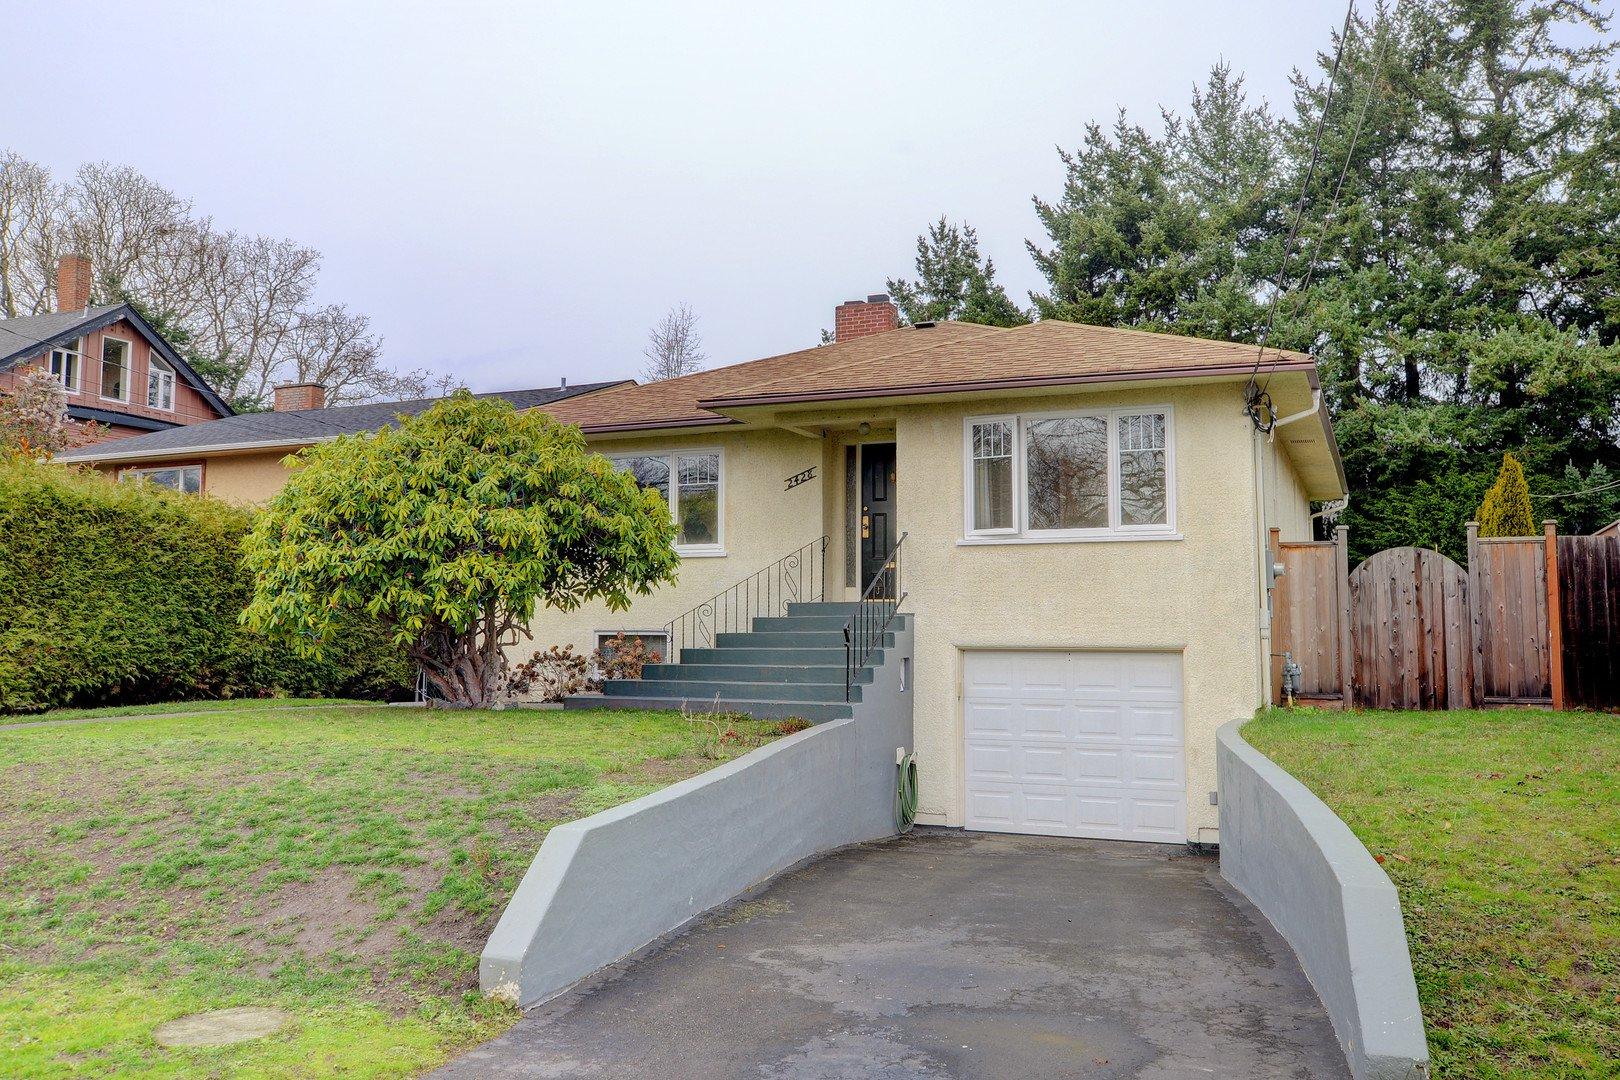 Main Photo: 2428 Dalhousie St in VICTORIA: OB Estevan Single Family Detached for sale (Oak Bay)  : MLS®# 777022